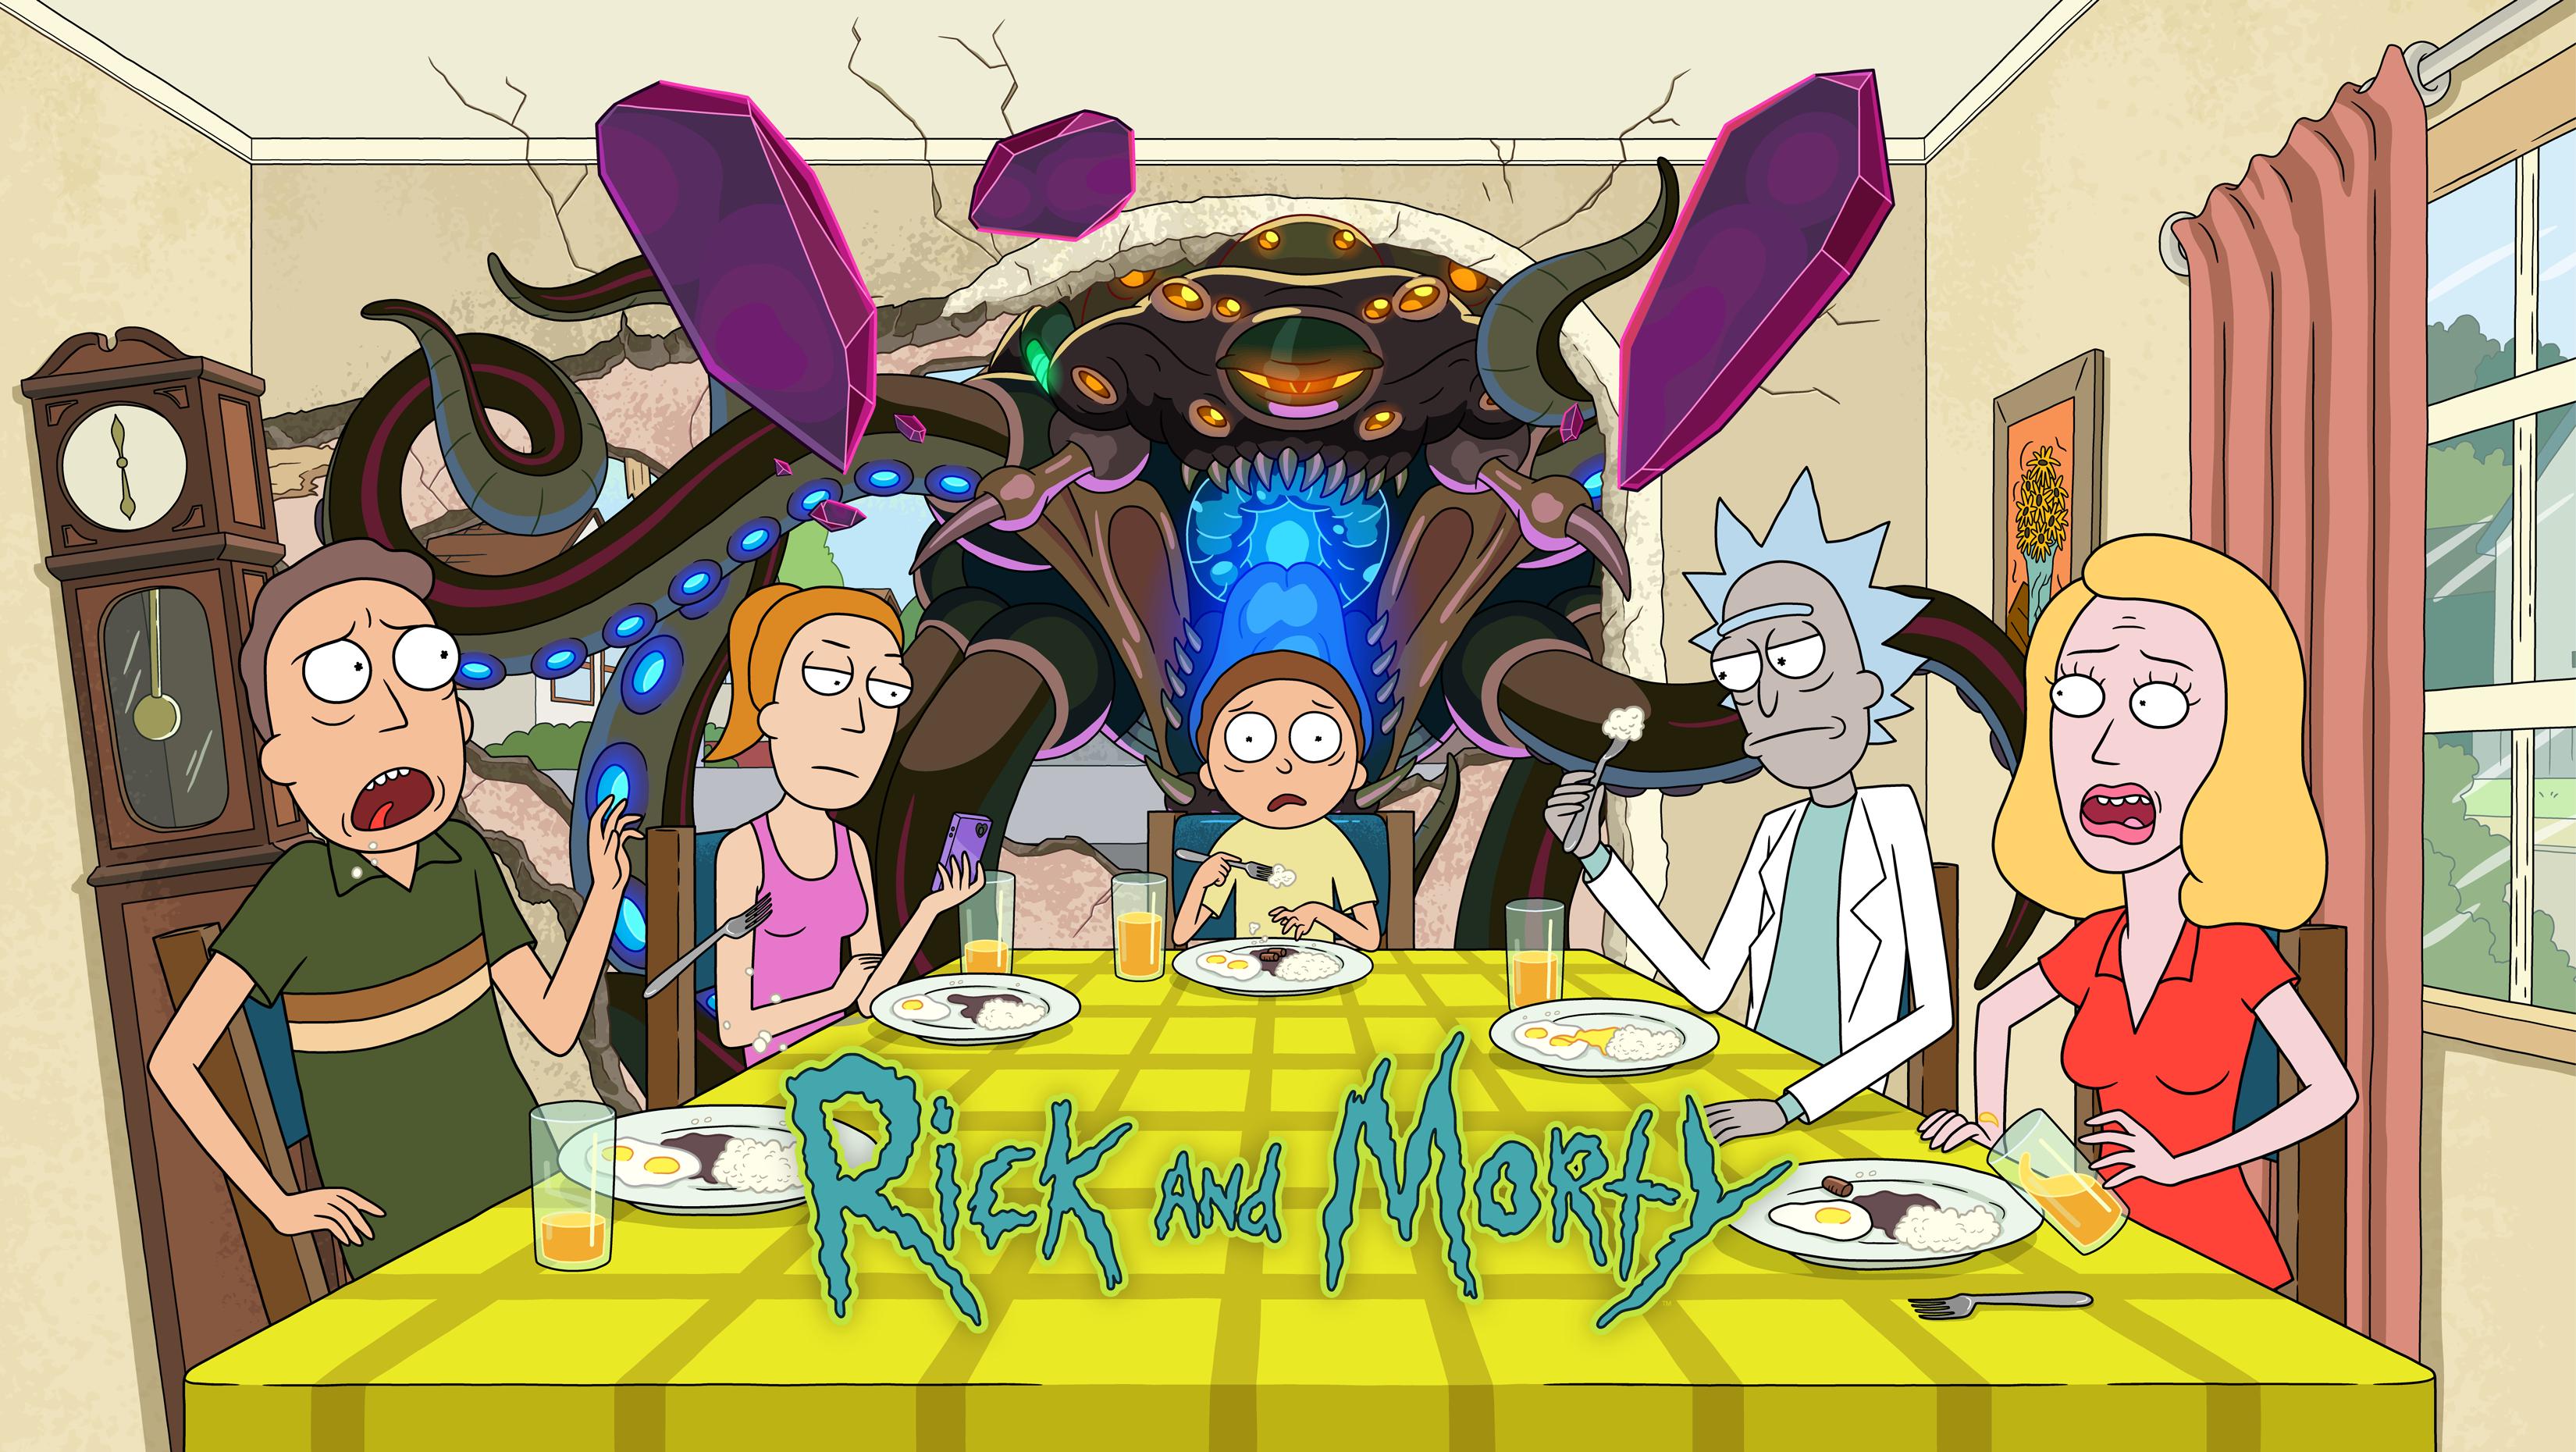 Rick and Morty - Season 5 Premiere - graphic image